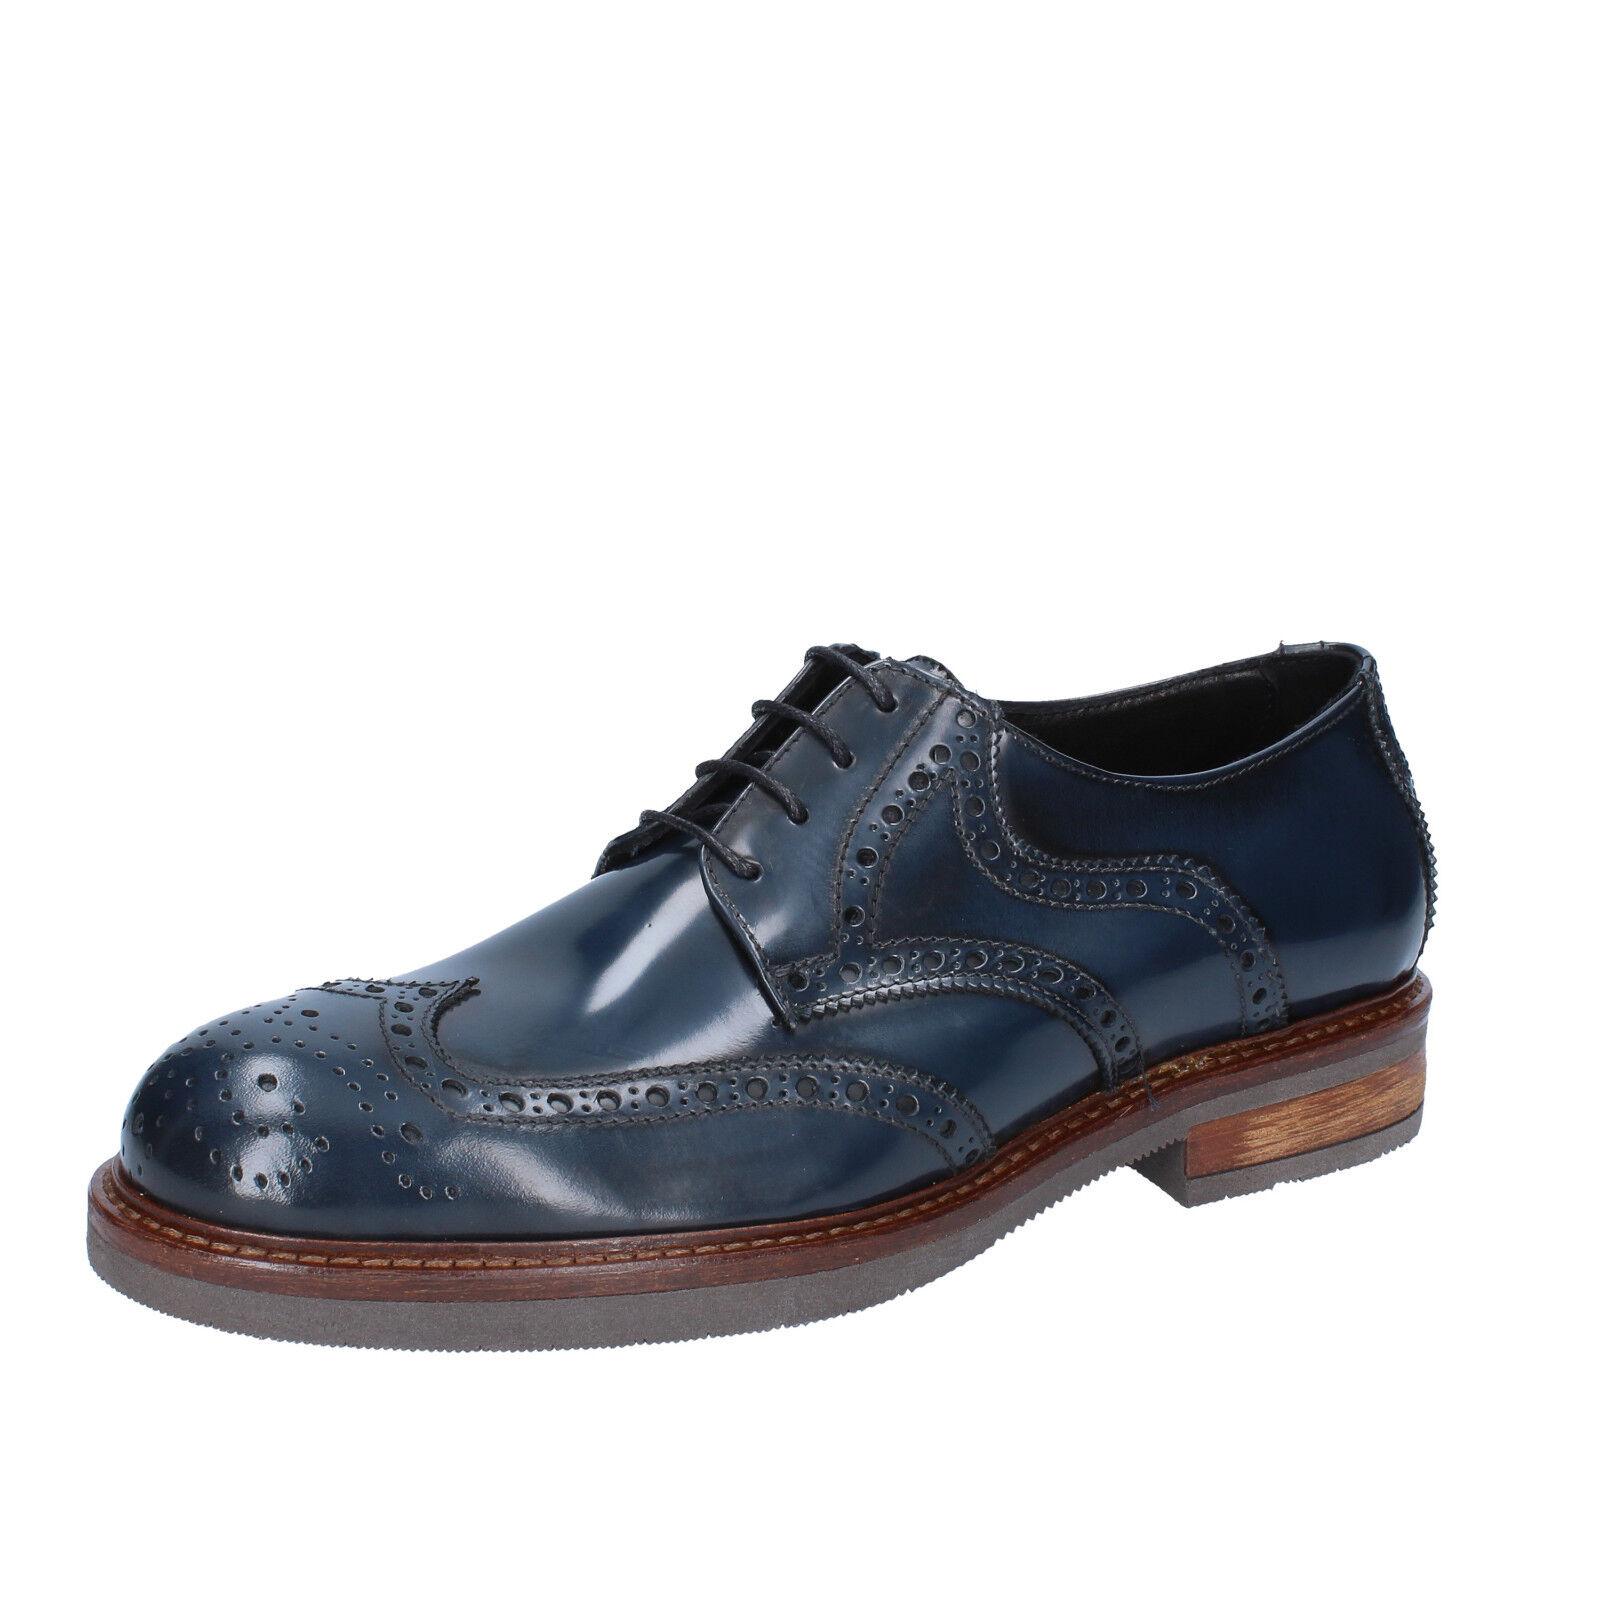 Men's (EU schuhe FDF Schuhe 8 (EU Men's 41) elegant Blau shiny Leder BZ334-C 0853ff